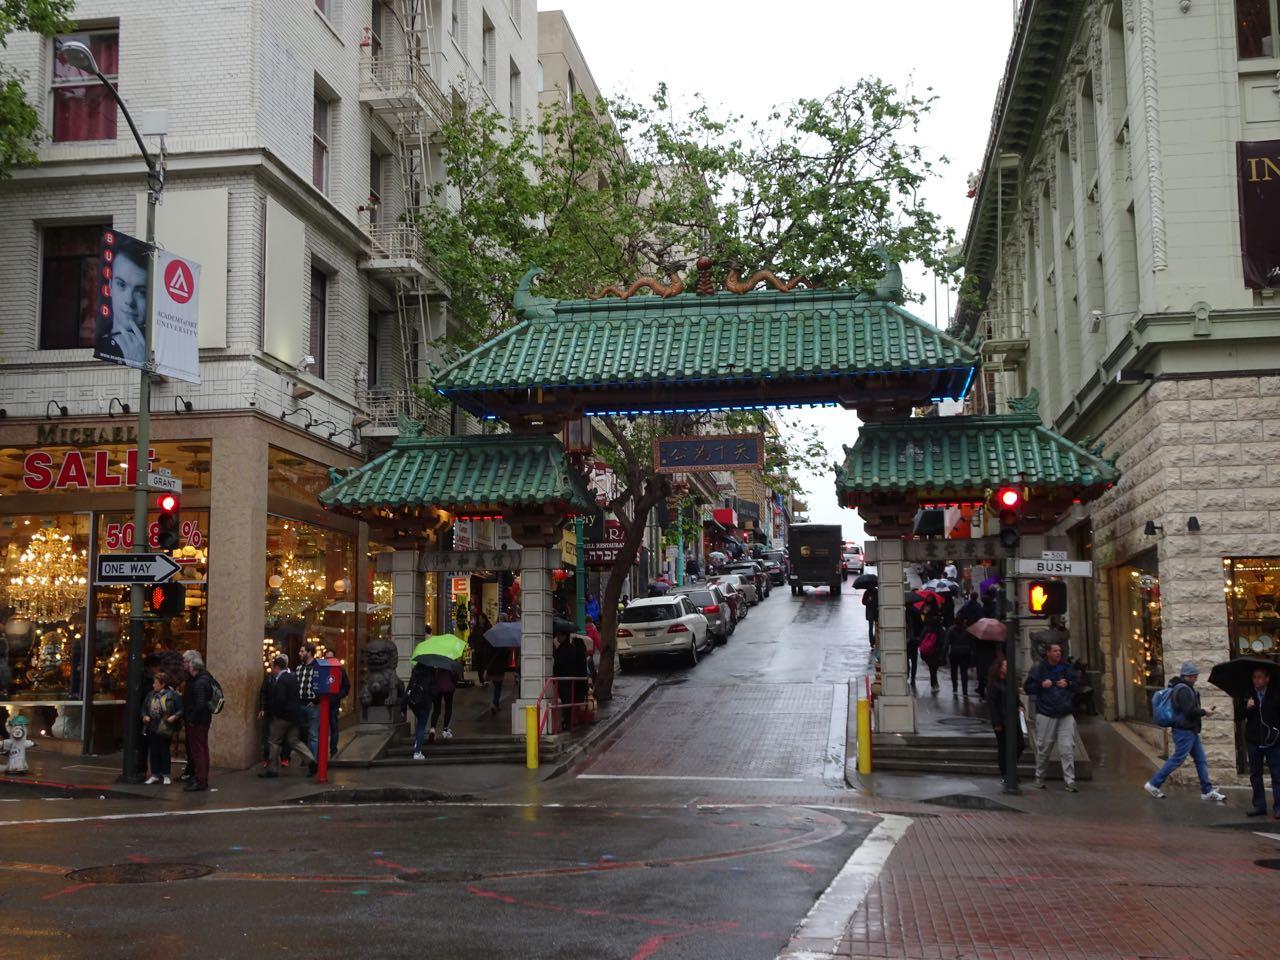 Gate of Chinatown